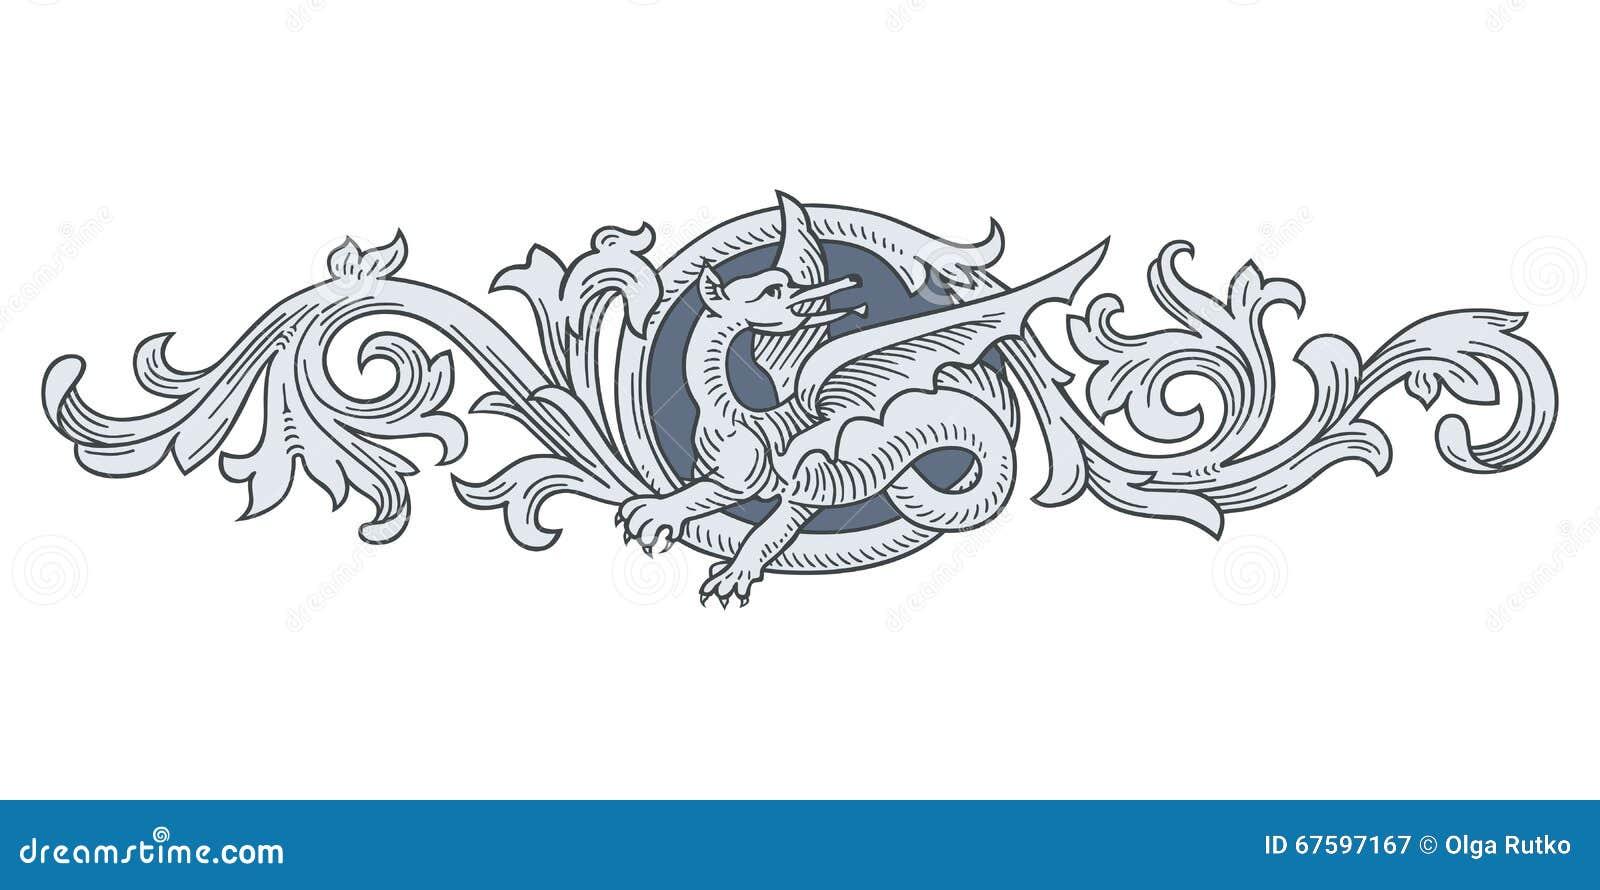 Dragon Frame Ornament stock vector. Illustration of branch - 67597167